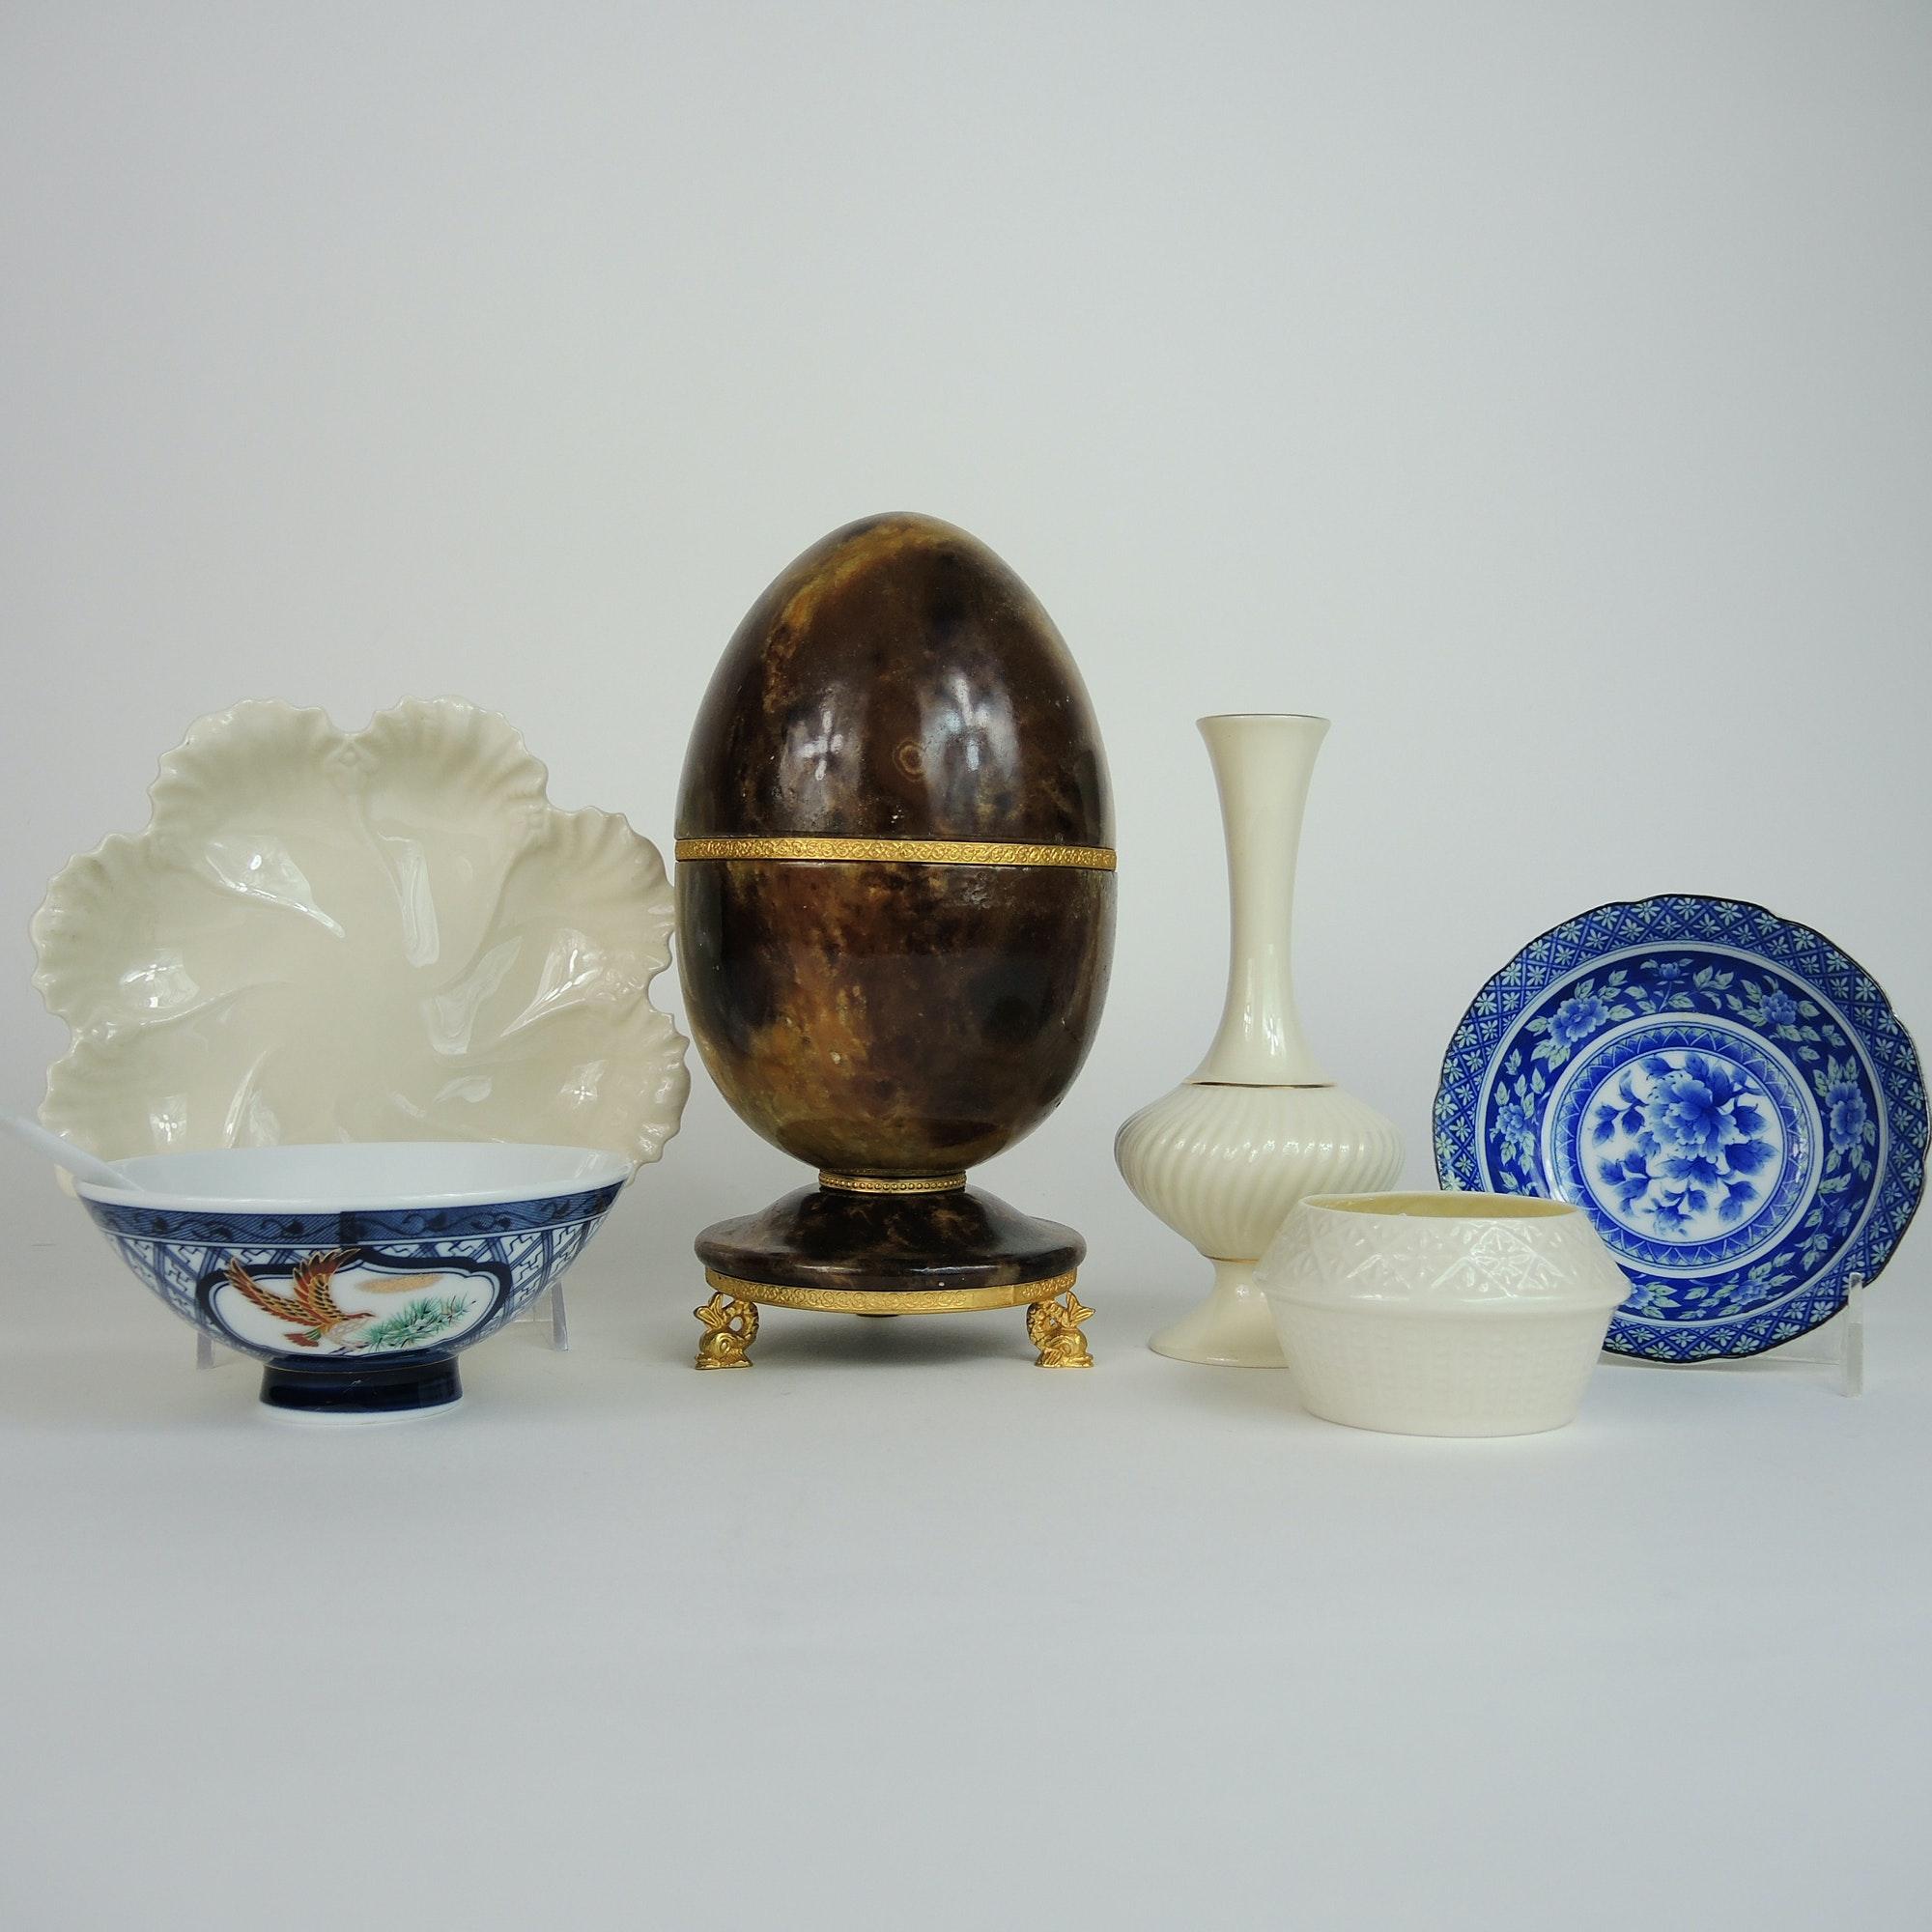 Alabaster Egg Box, Beleek, Lenox and Asian Pottery